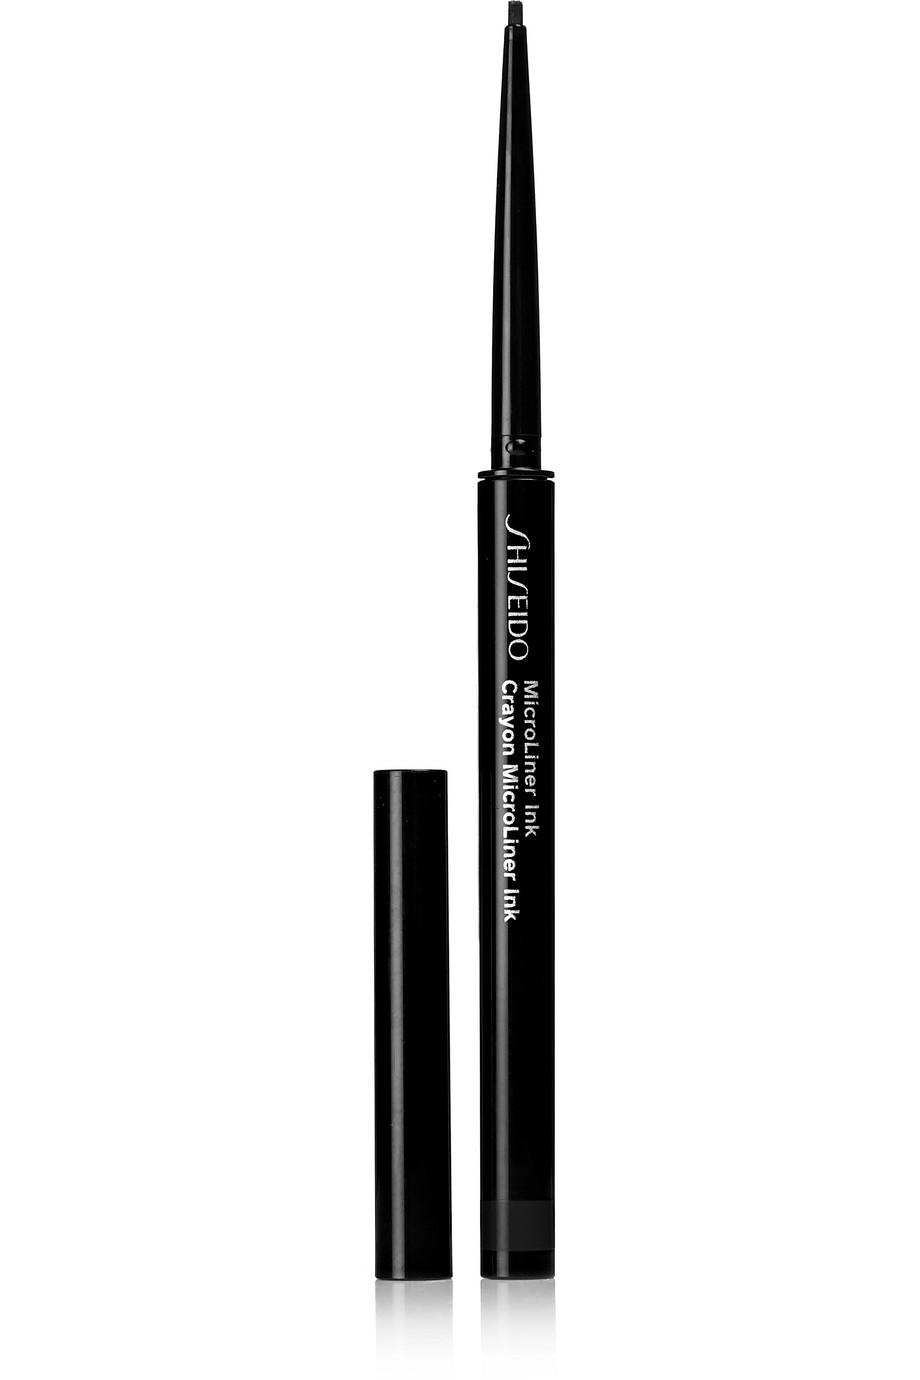 Shiseido MicroLiner Ink – Black 01 – Eyeliner